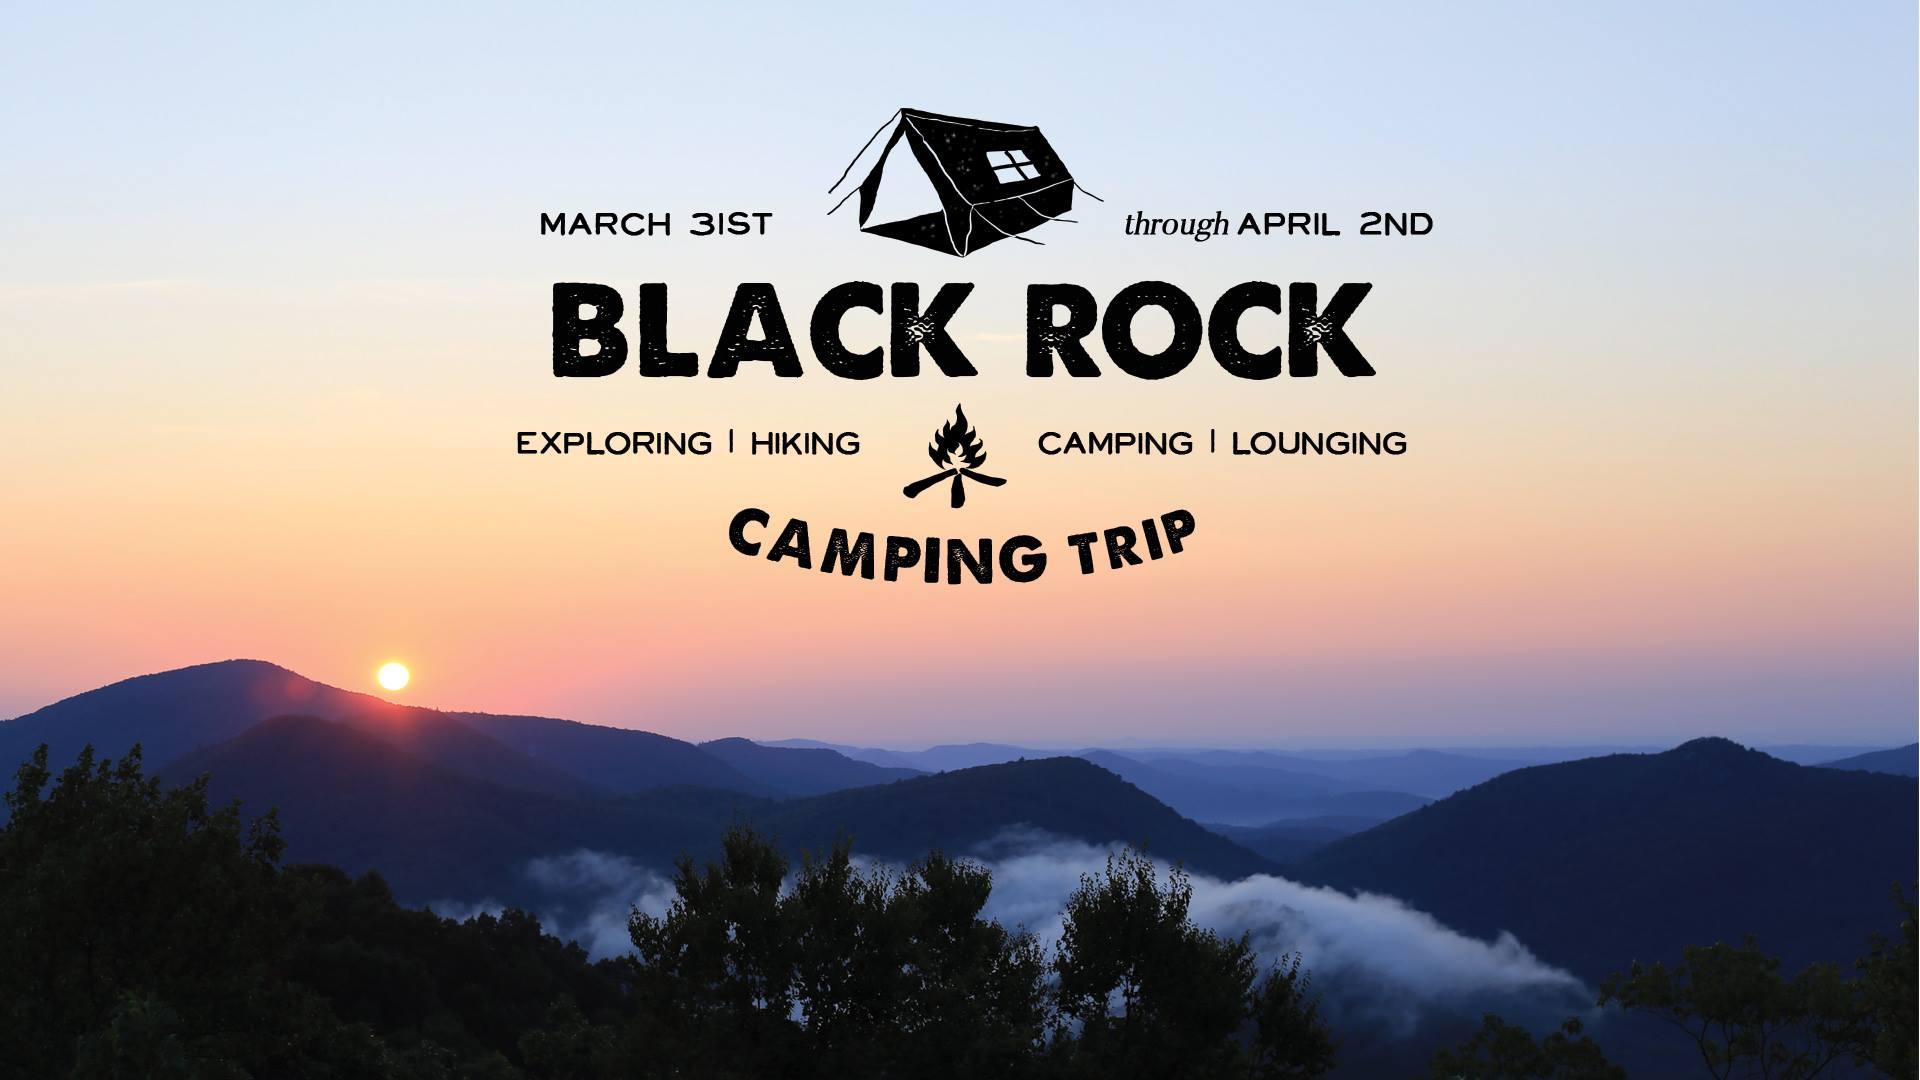 Black Rock Camping Trip